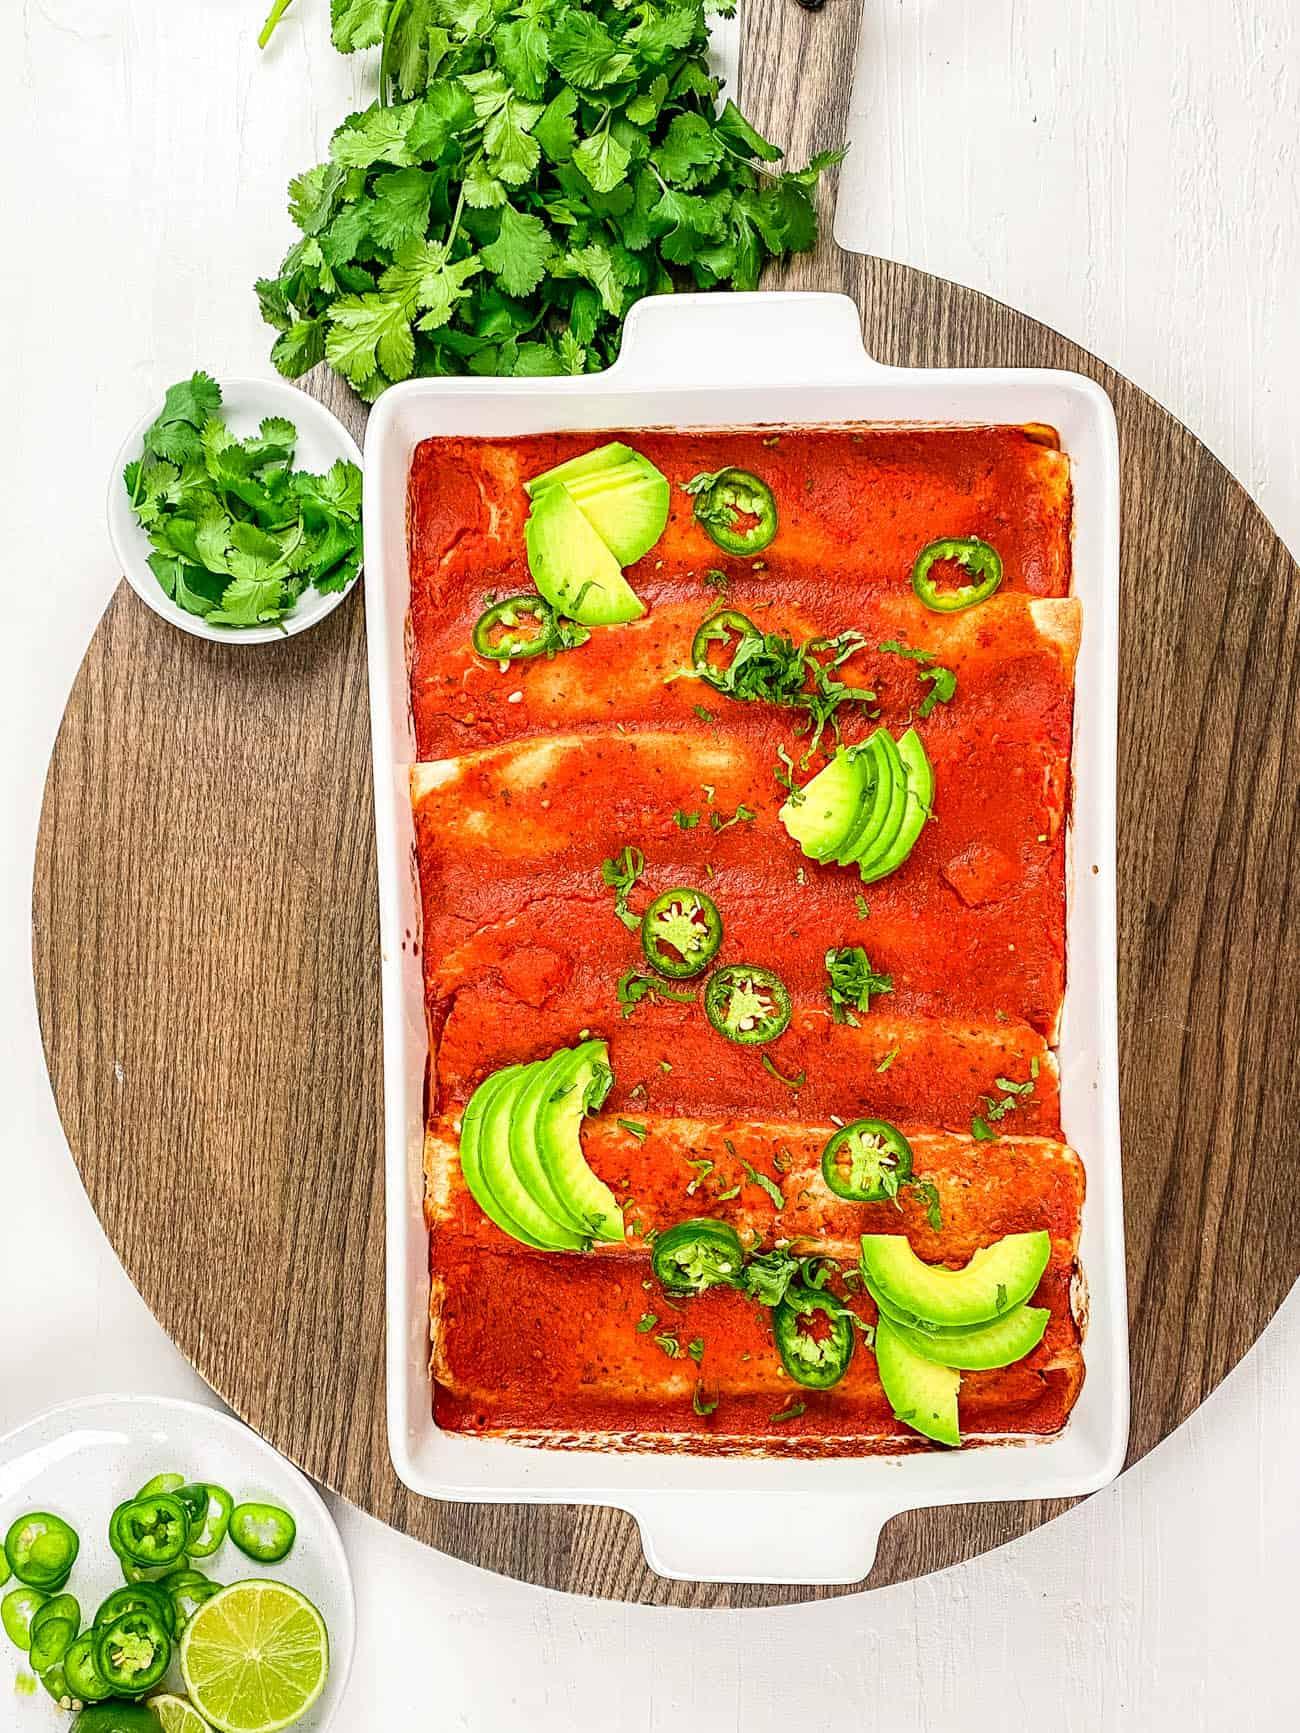 easy healthy vegan enchilada casserole recipe ready to go in the oven